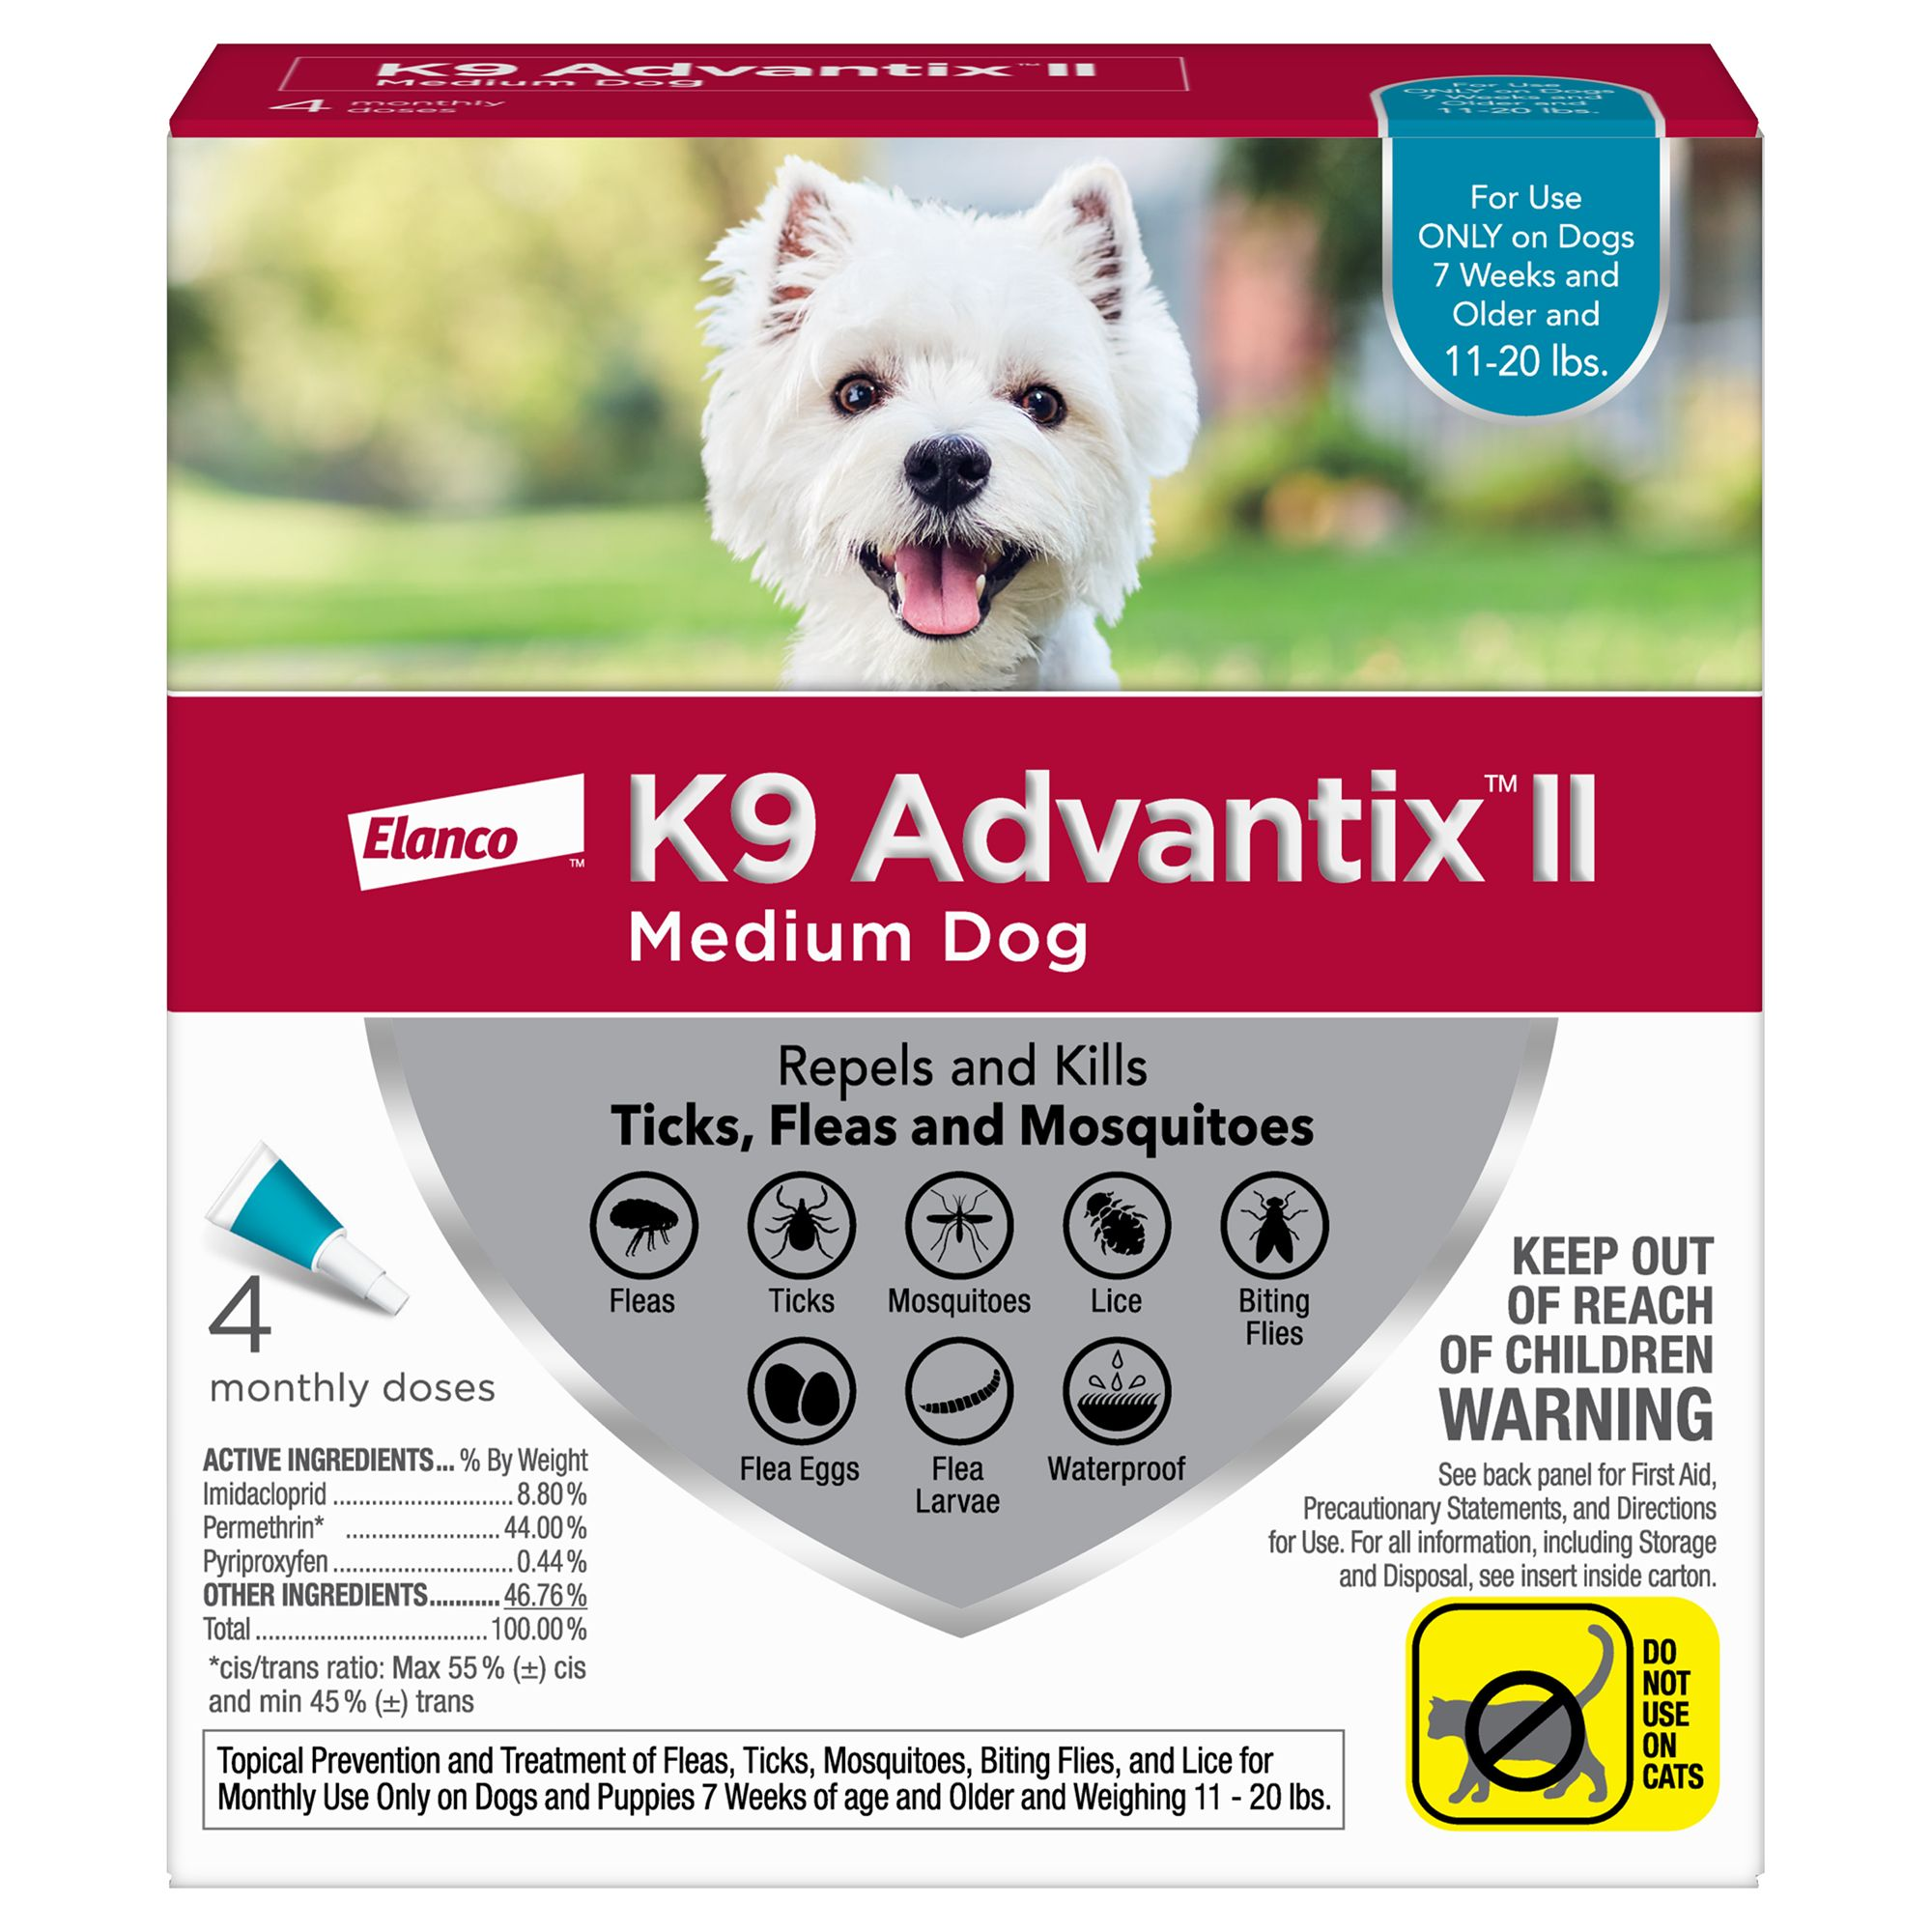 K9 Advantix Ii 11 20 Lbs Dog Flea And Tick Treatment Size 4 Count